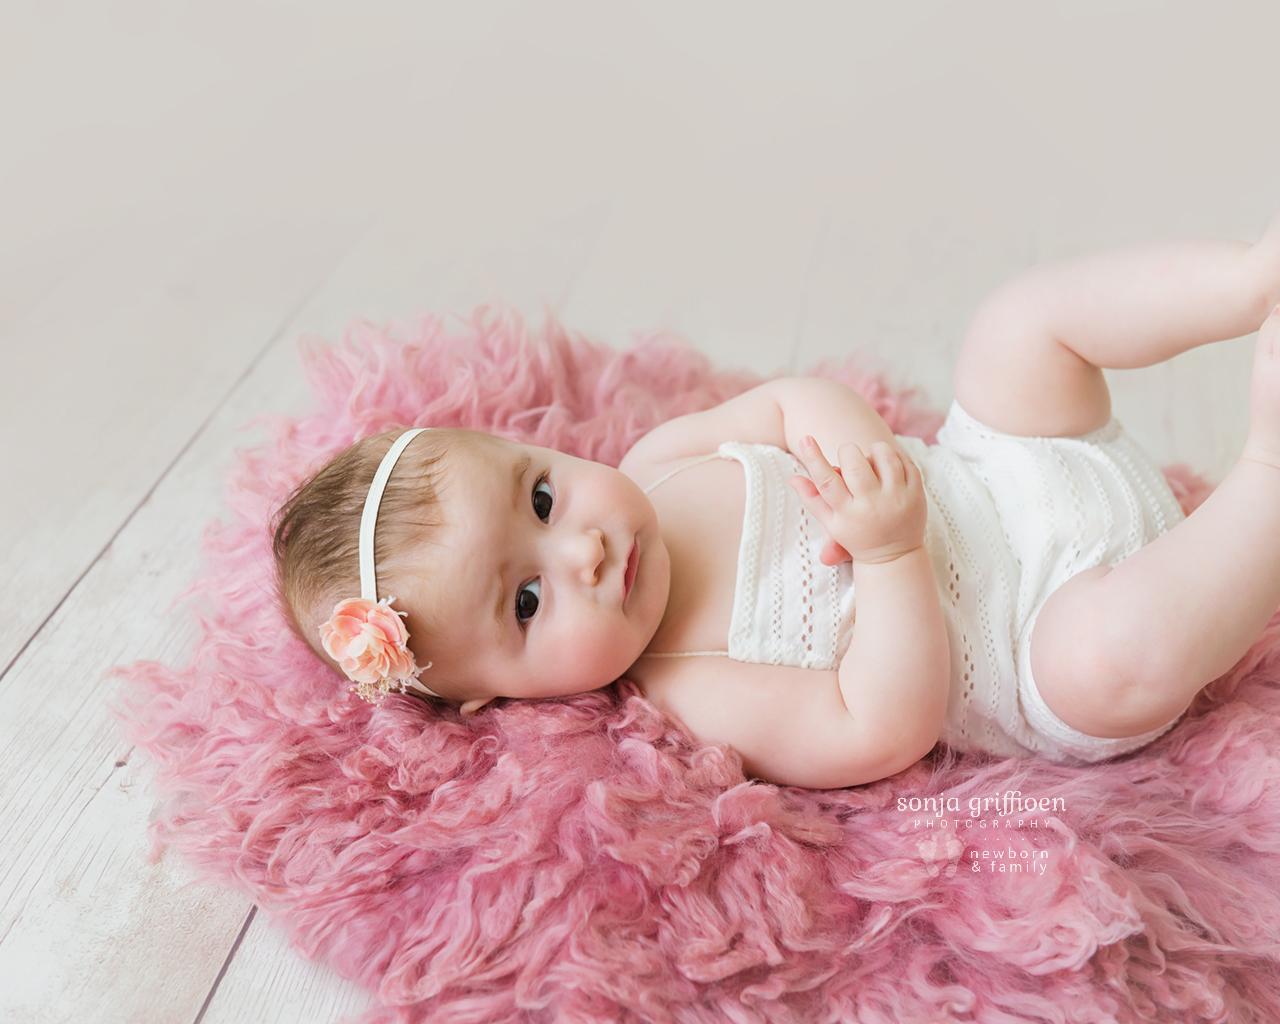 Everlyn-Milestone-Brisbane-Baby-Photography-Sonja-Griffioen-15.jpg